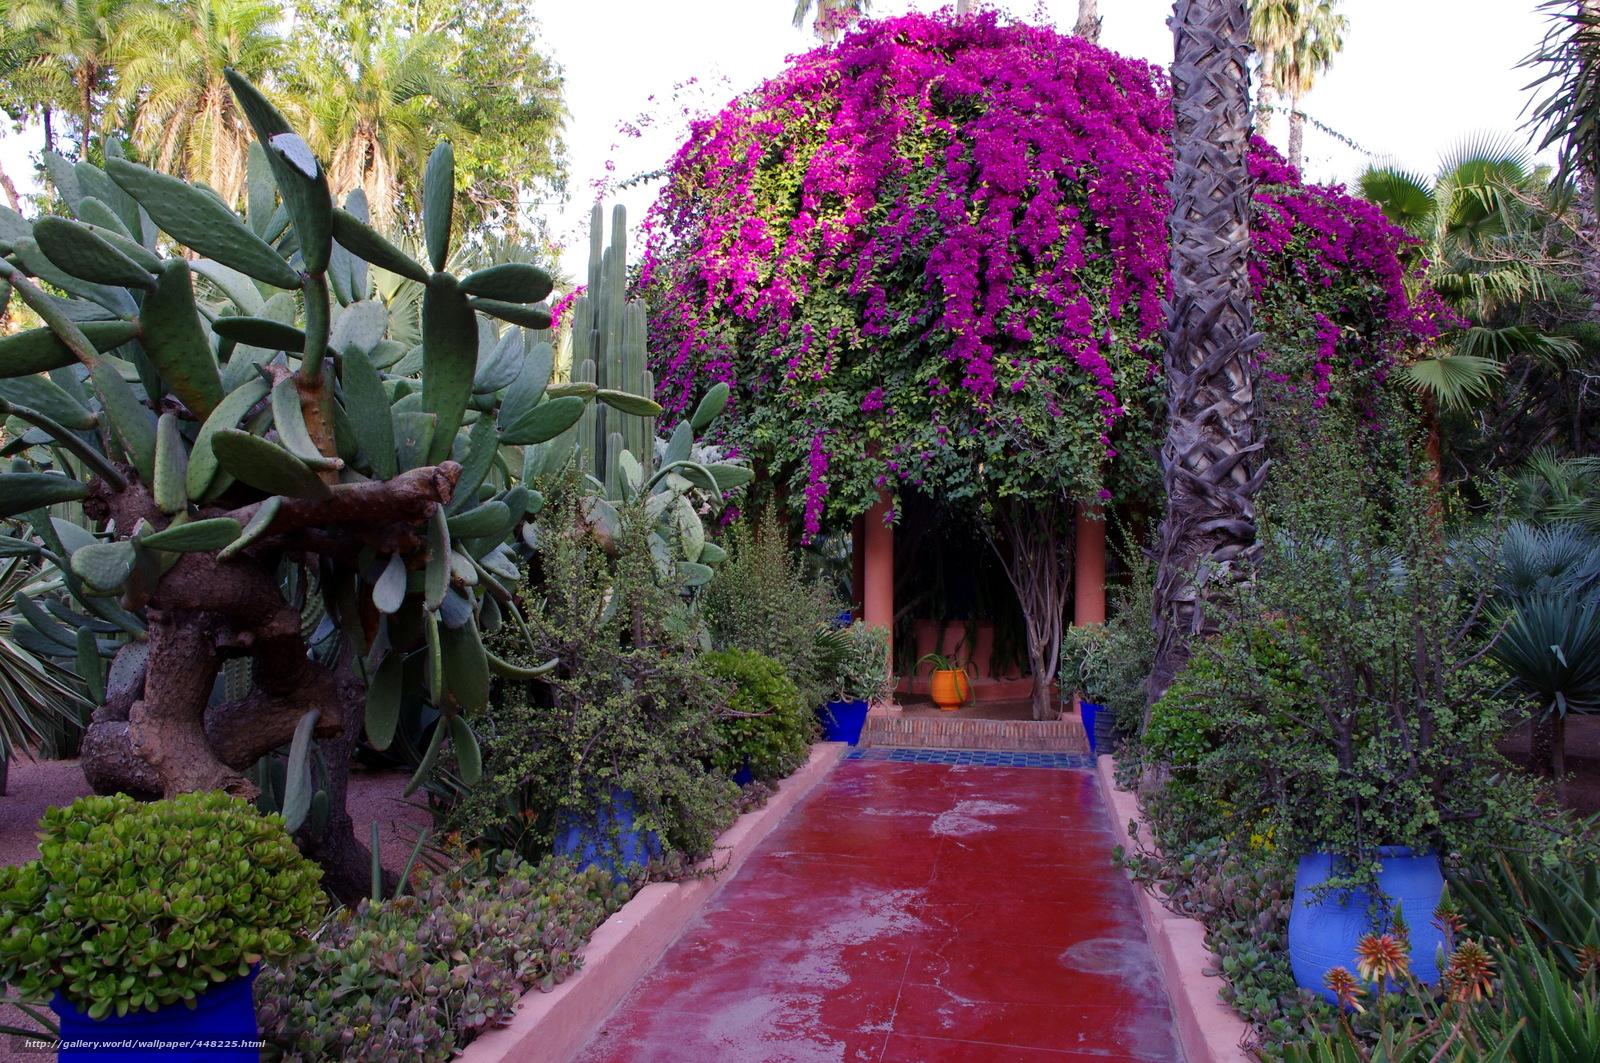 Download wallpaper garden morocco marrakech jardin for Jardin majorelle